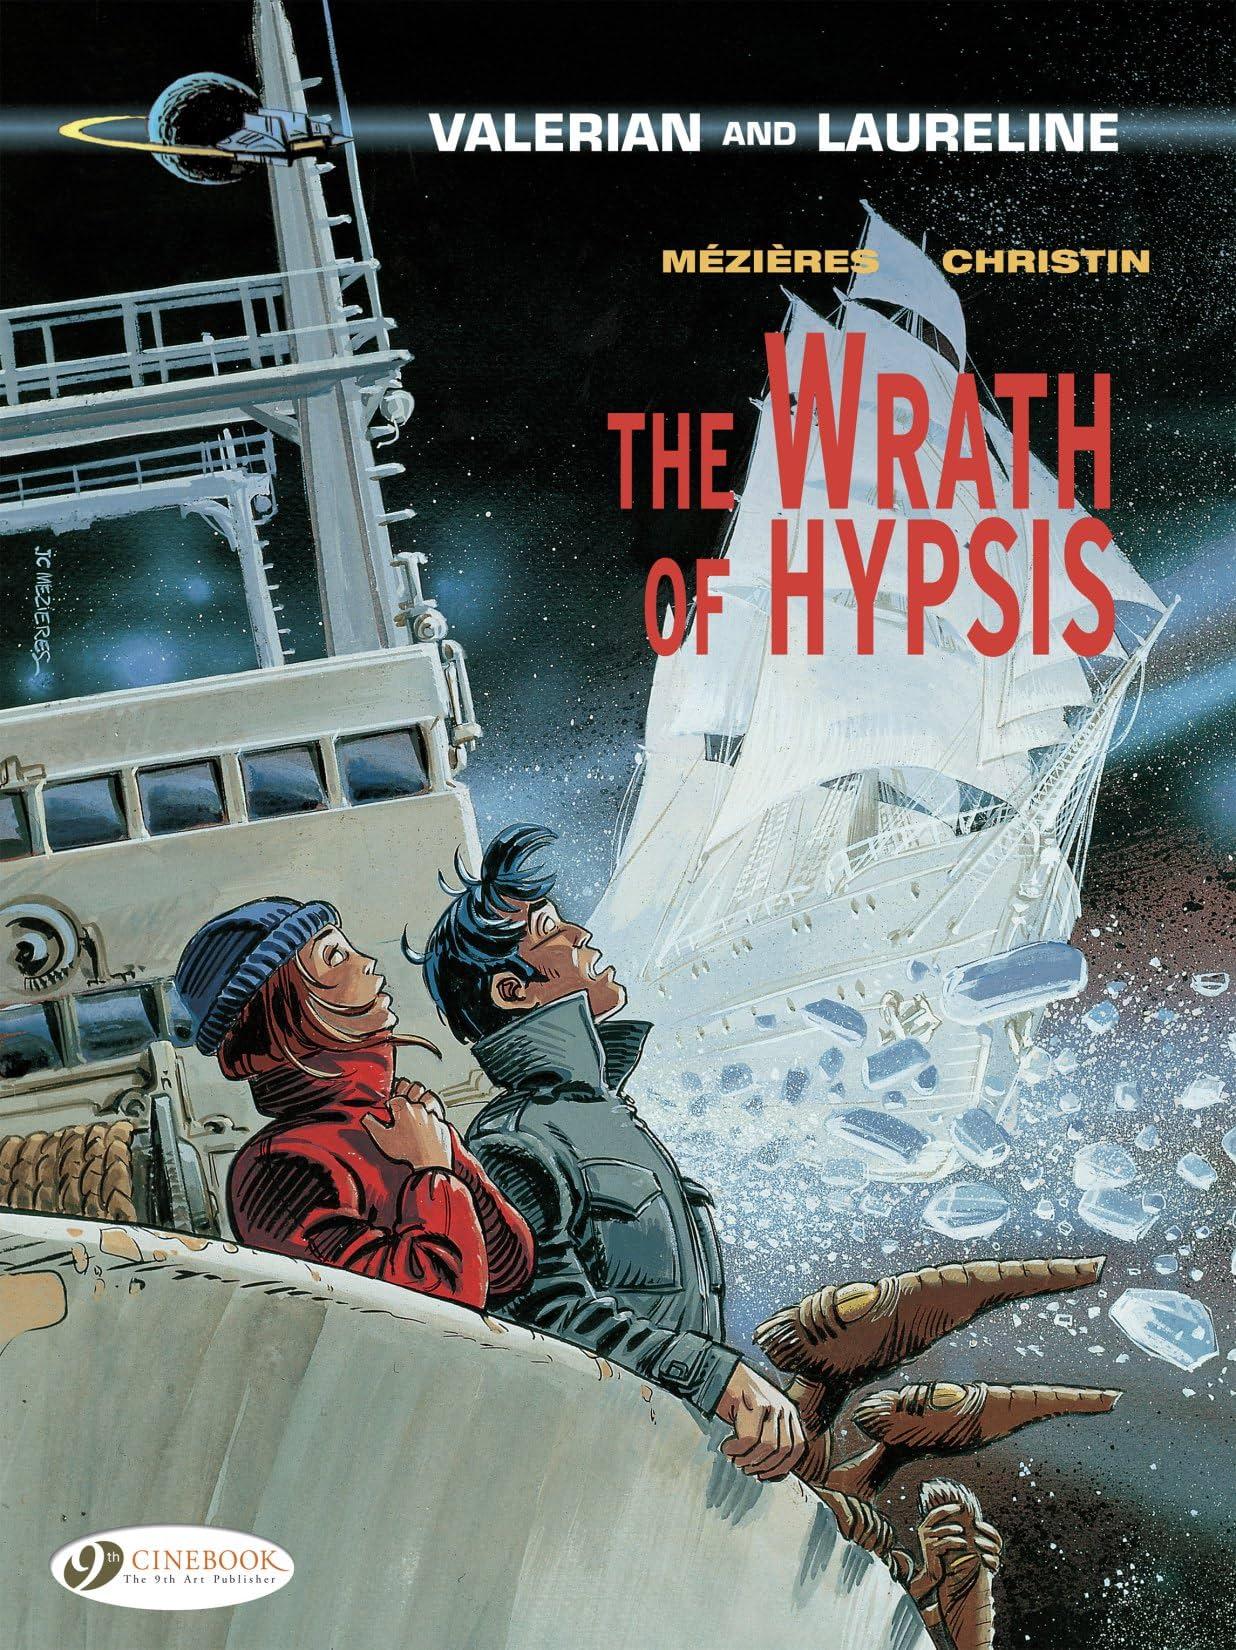 Valerian and Laureline Vol. 12: The wrath of Hypsis